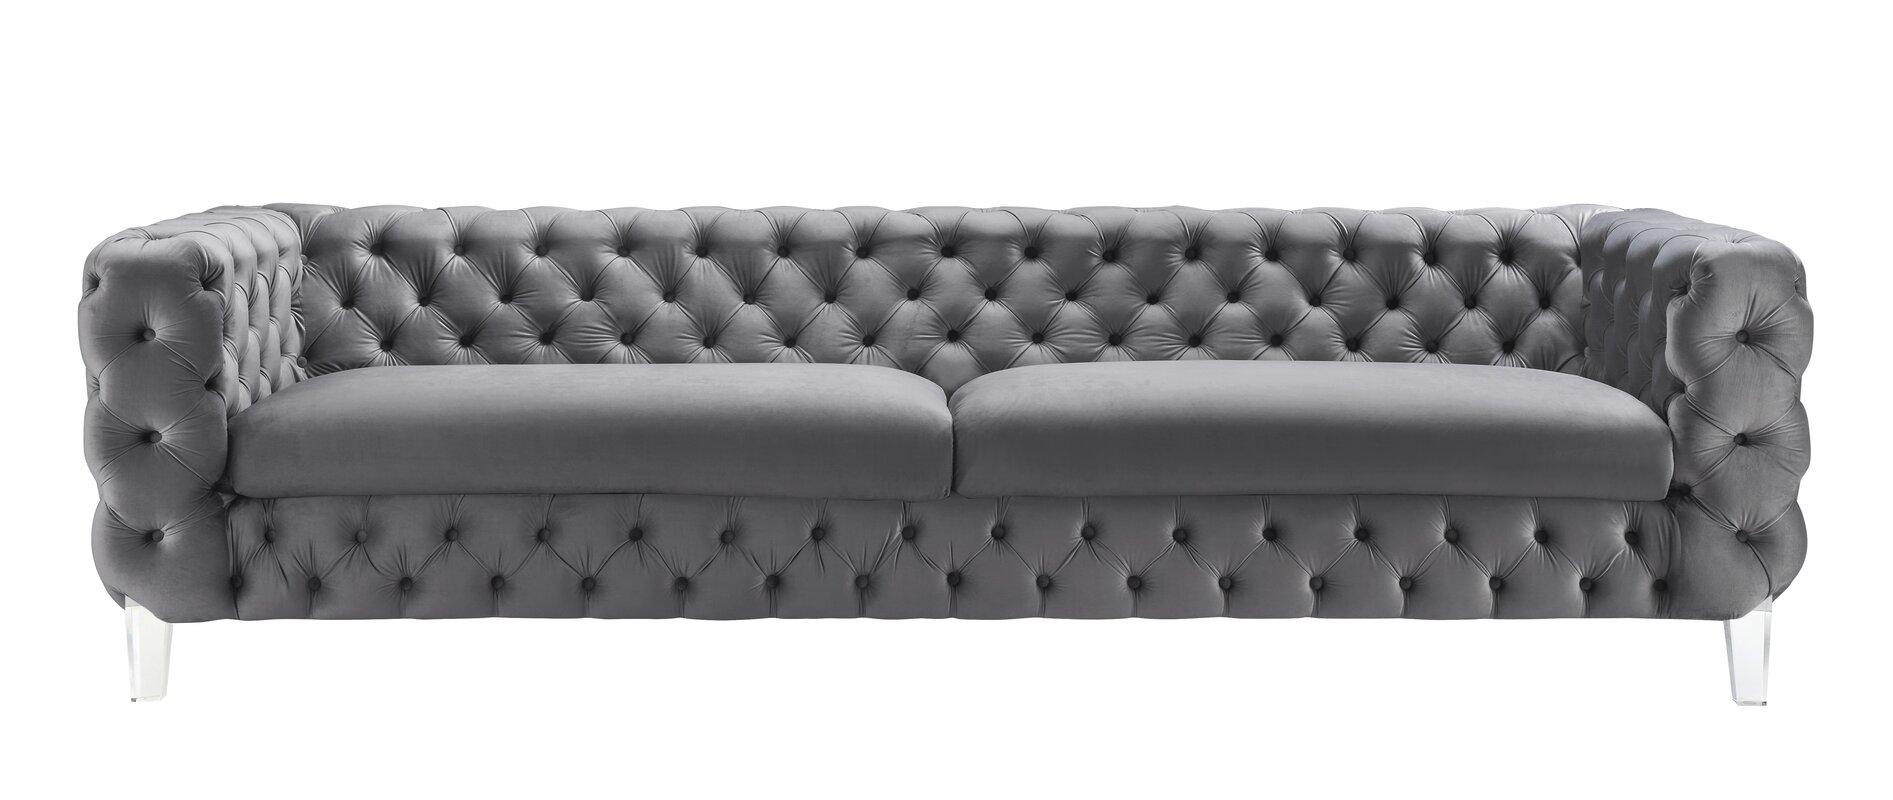 Lorenco Velvet Chesterfield Sofa